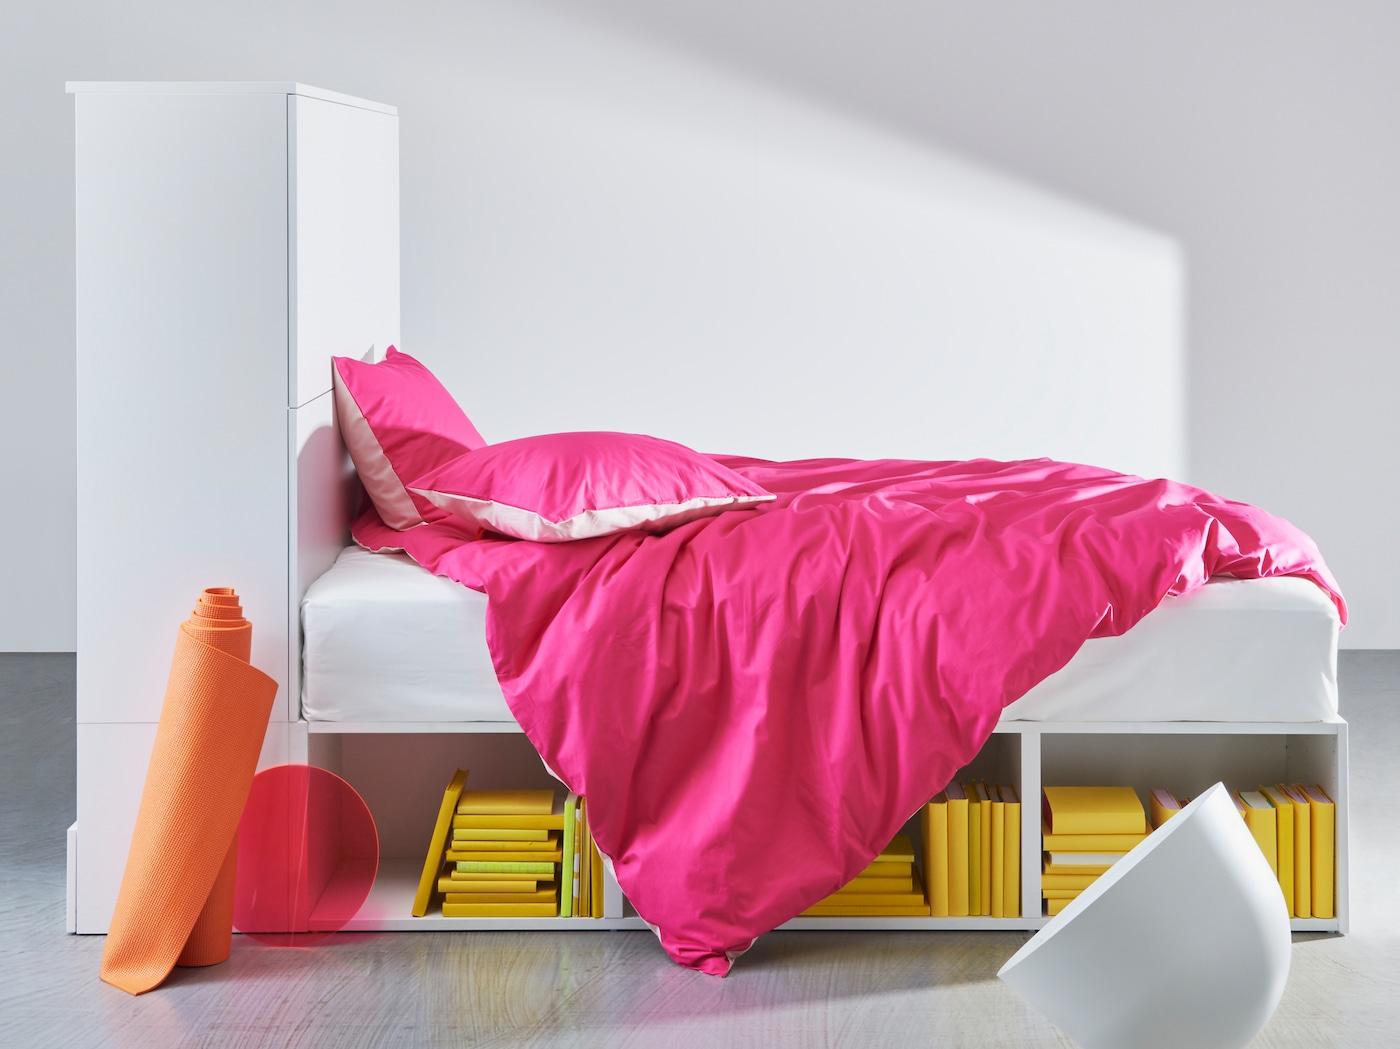 PLATSA 普拉萨 白色床架带储物,拥有床下开放式搁板和一端带门的封闭式储物。